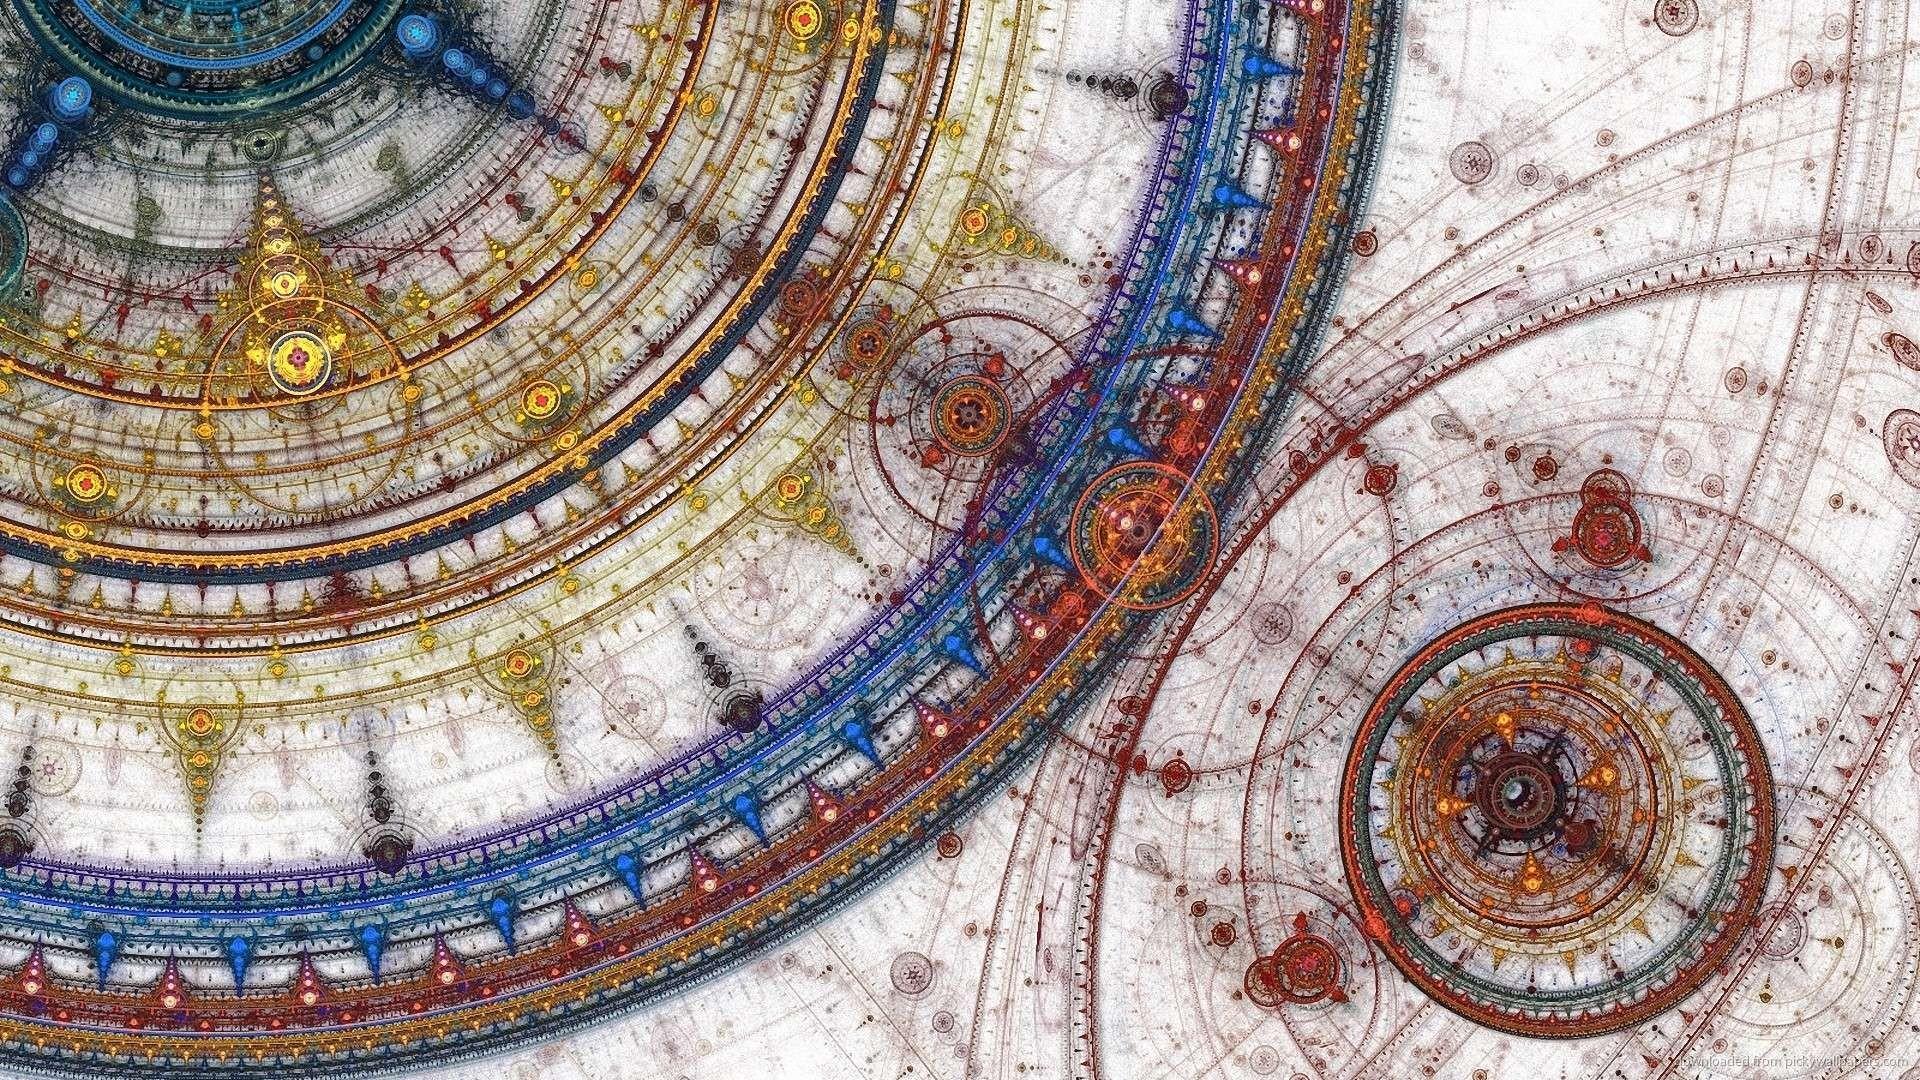 Desktop Wallpaper Art ·① Download Free Wallpapers For